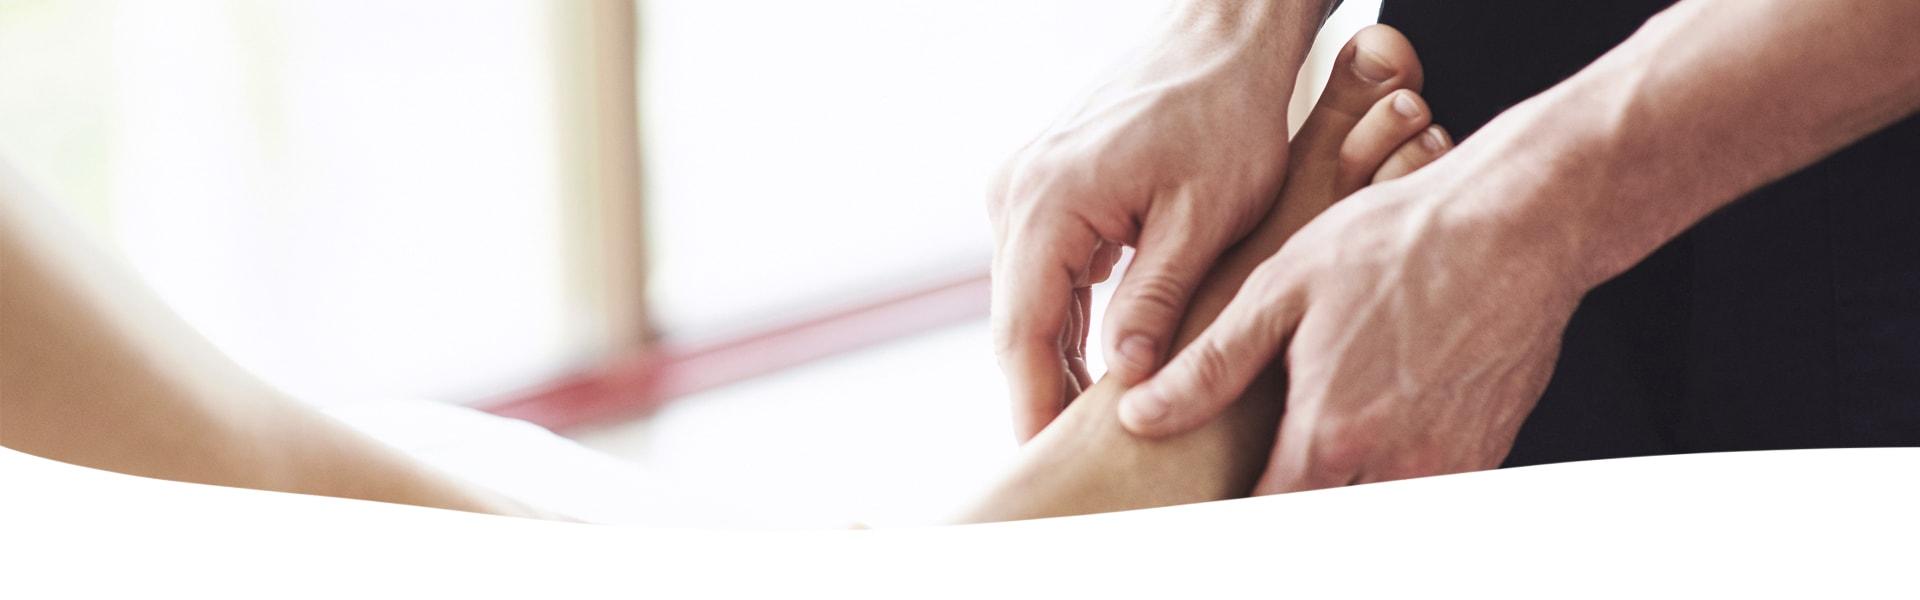 healthy feet clinic uk testimonials